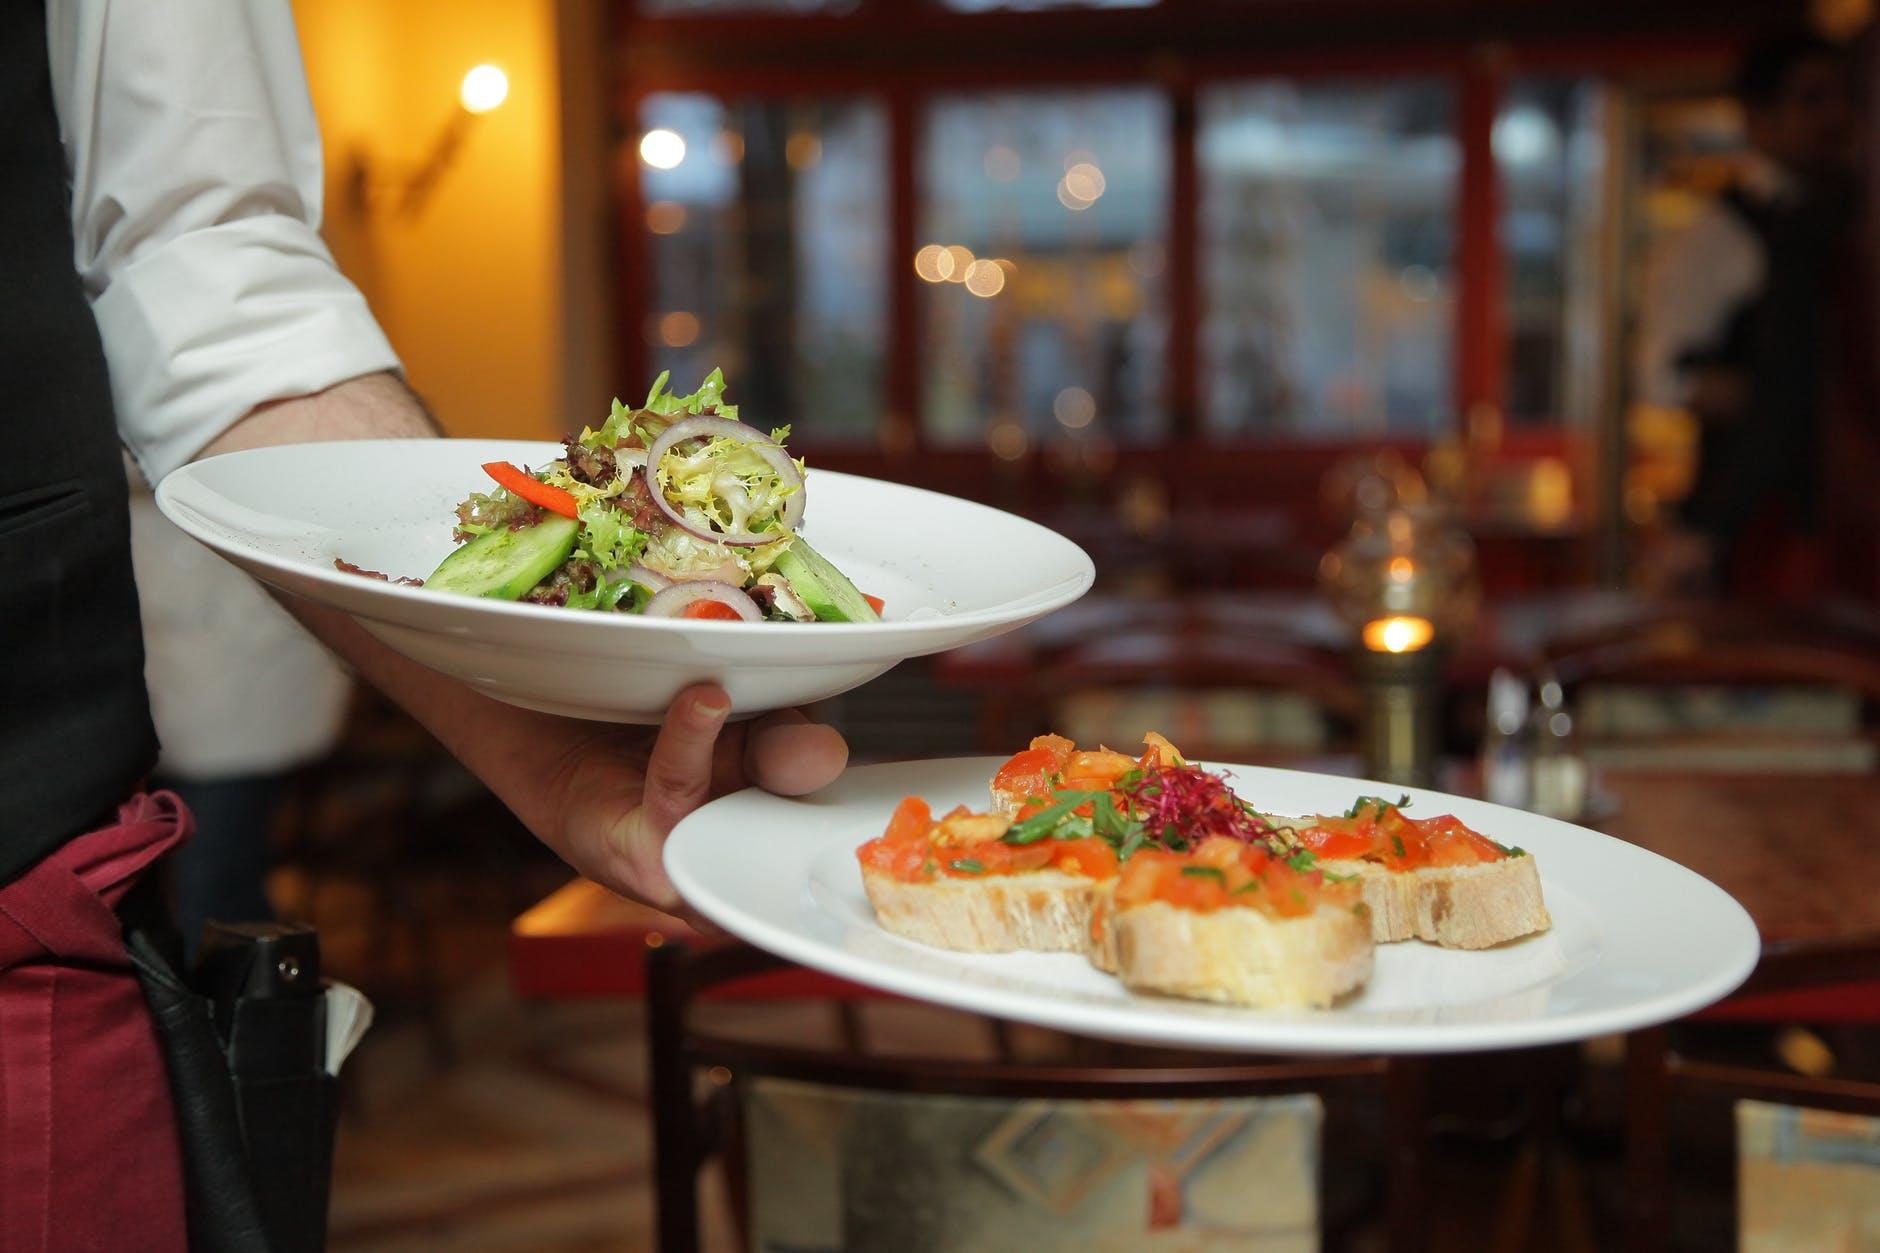 Good Restaurant Service